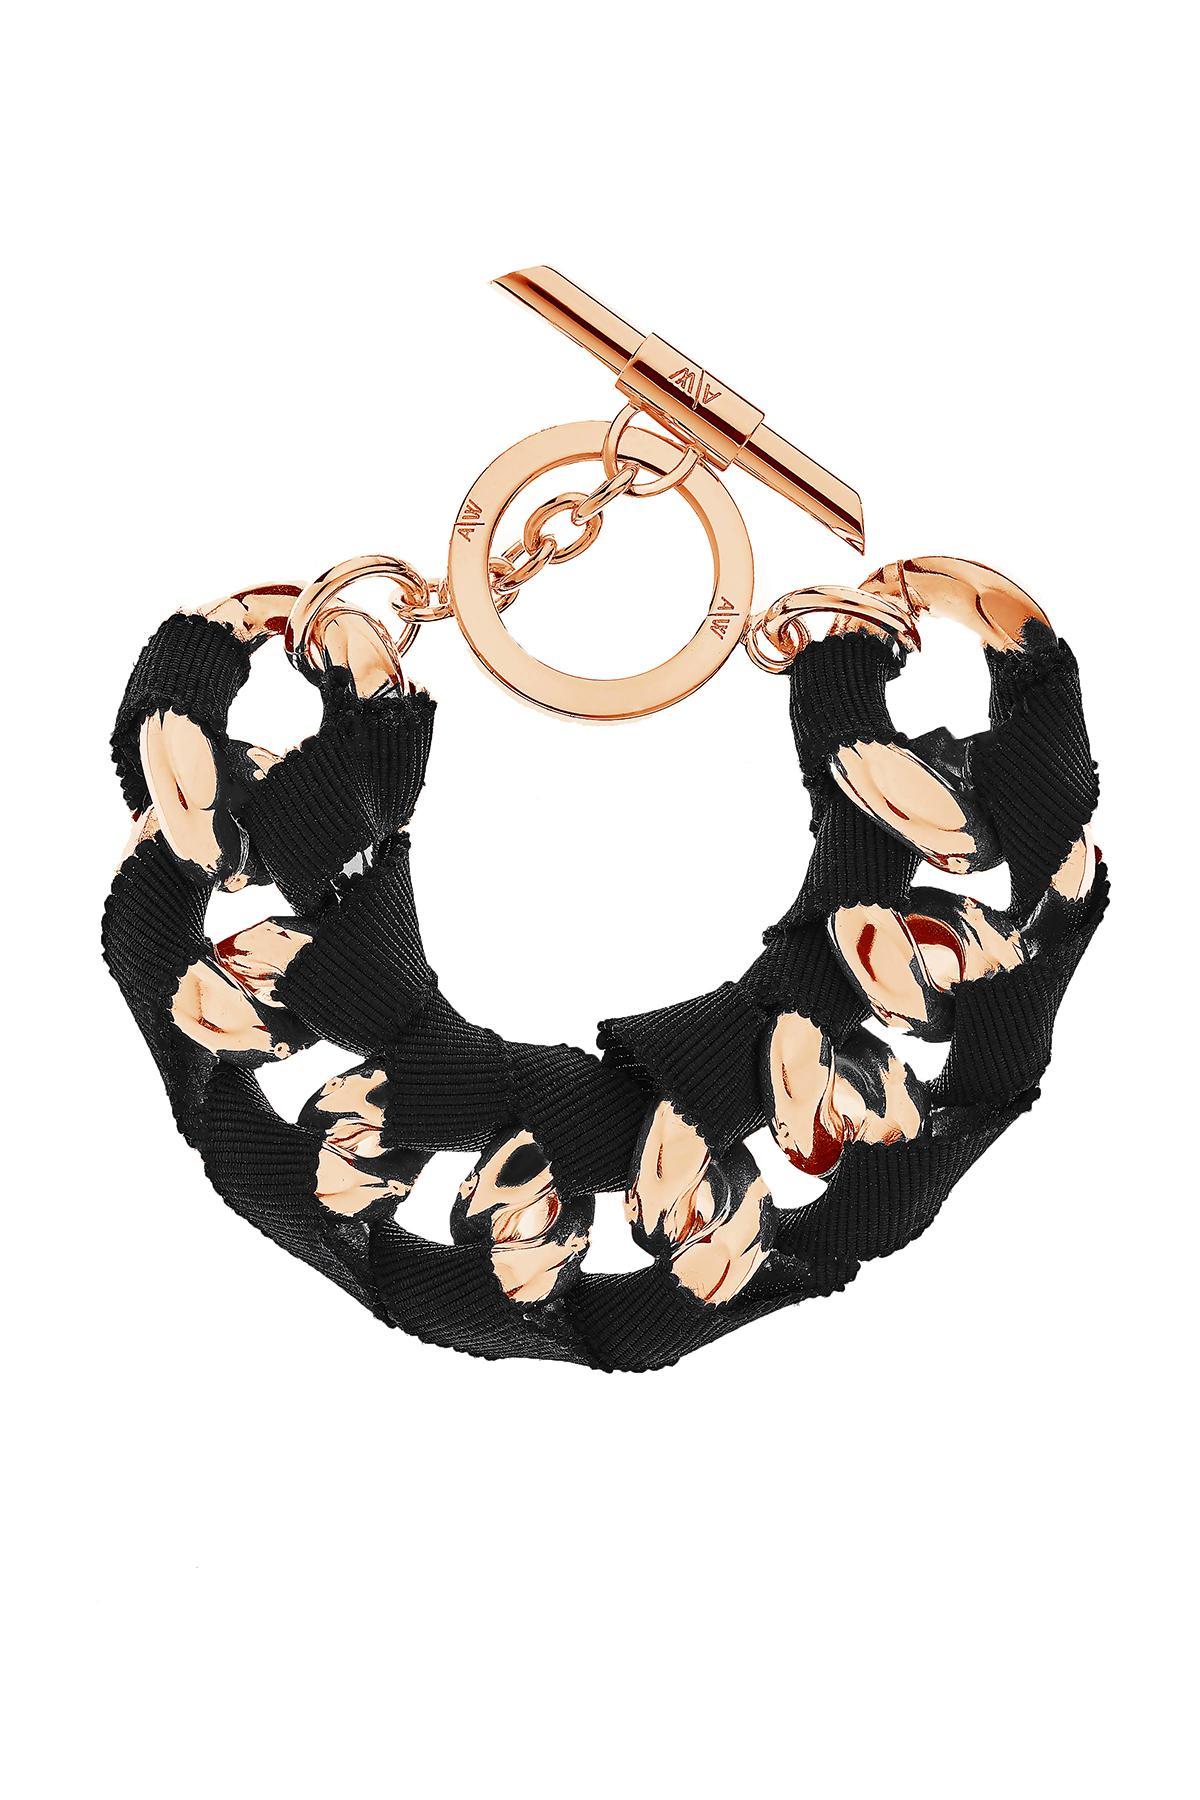 Amanda Wakeley Chunky Gold Bracelet 64Cd5GC